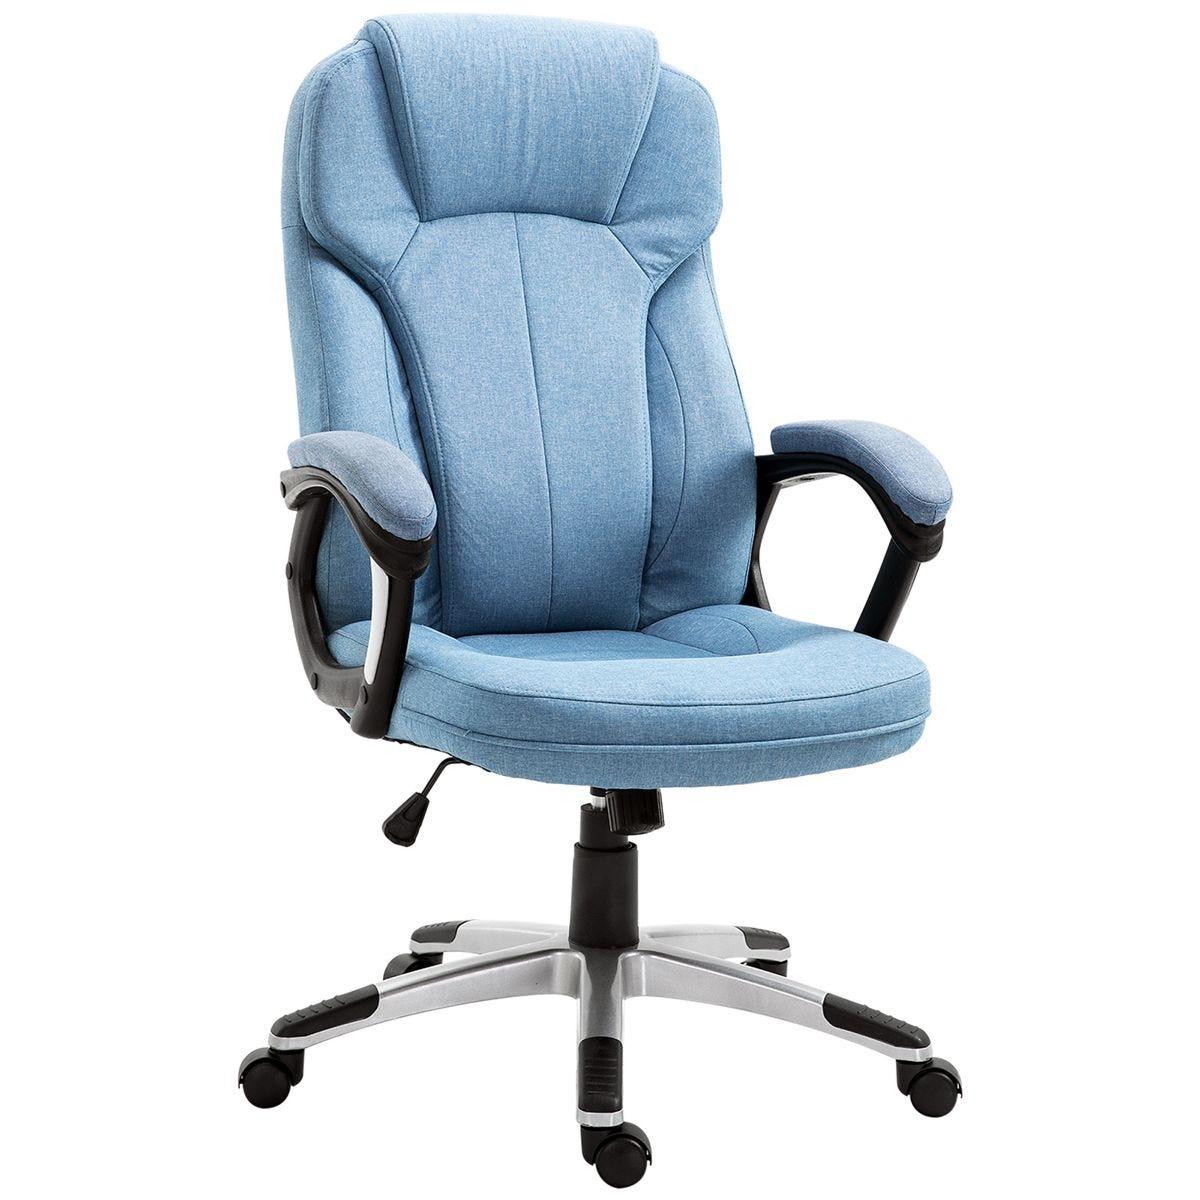 Solstice Spruce Linen Ergonomic Office Chair - Light Blue